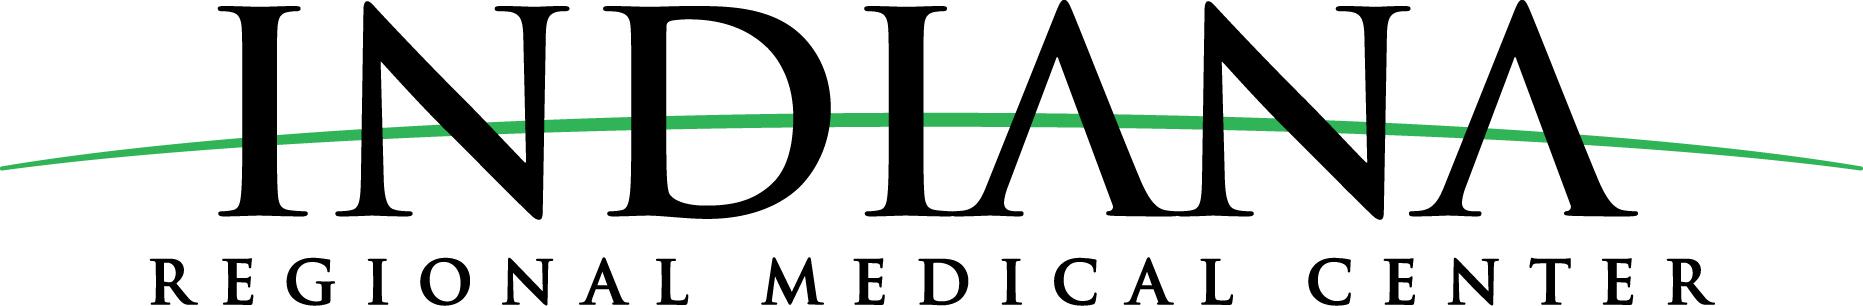 Indiana Regional Medical Center